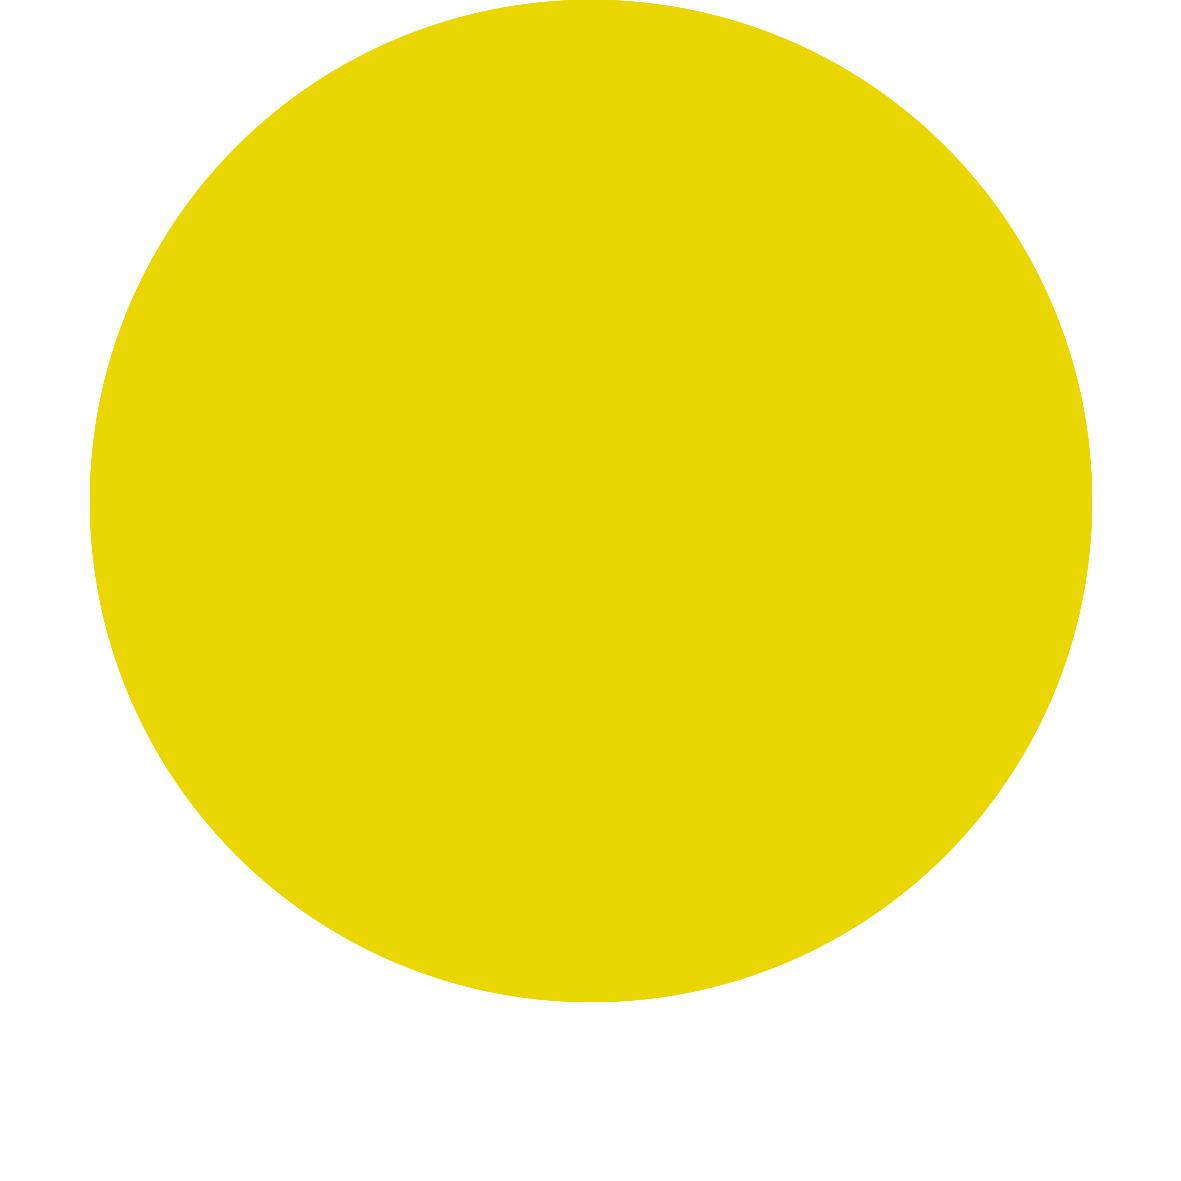 C.I. Yellow 74 trans(Yellow 5GT) -